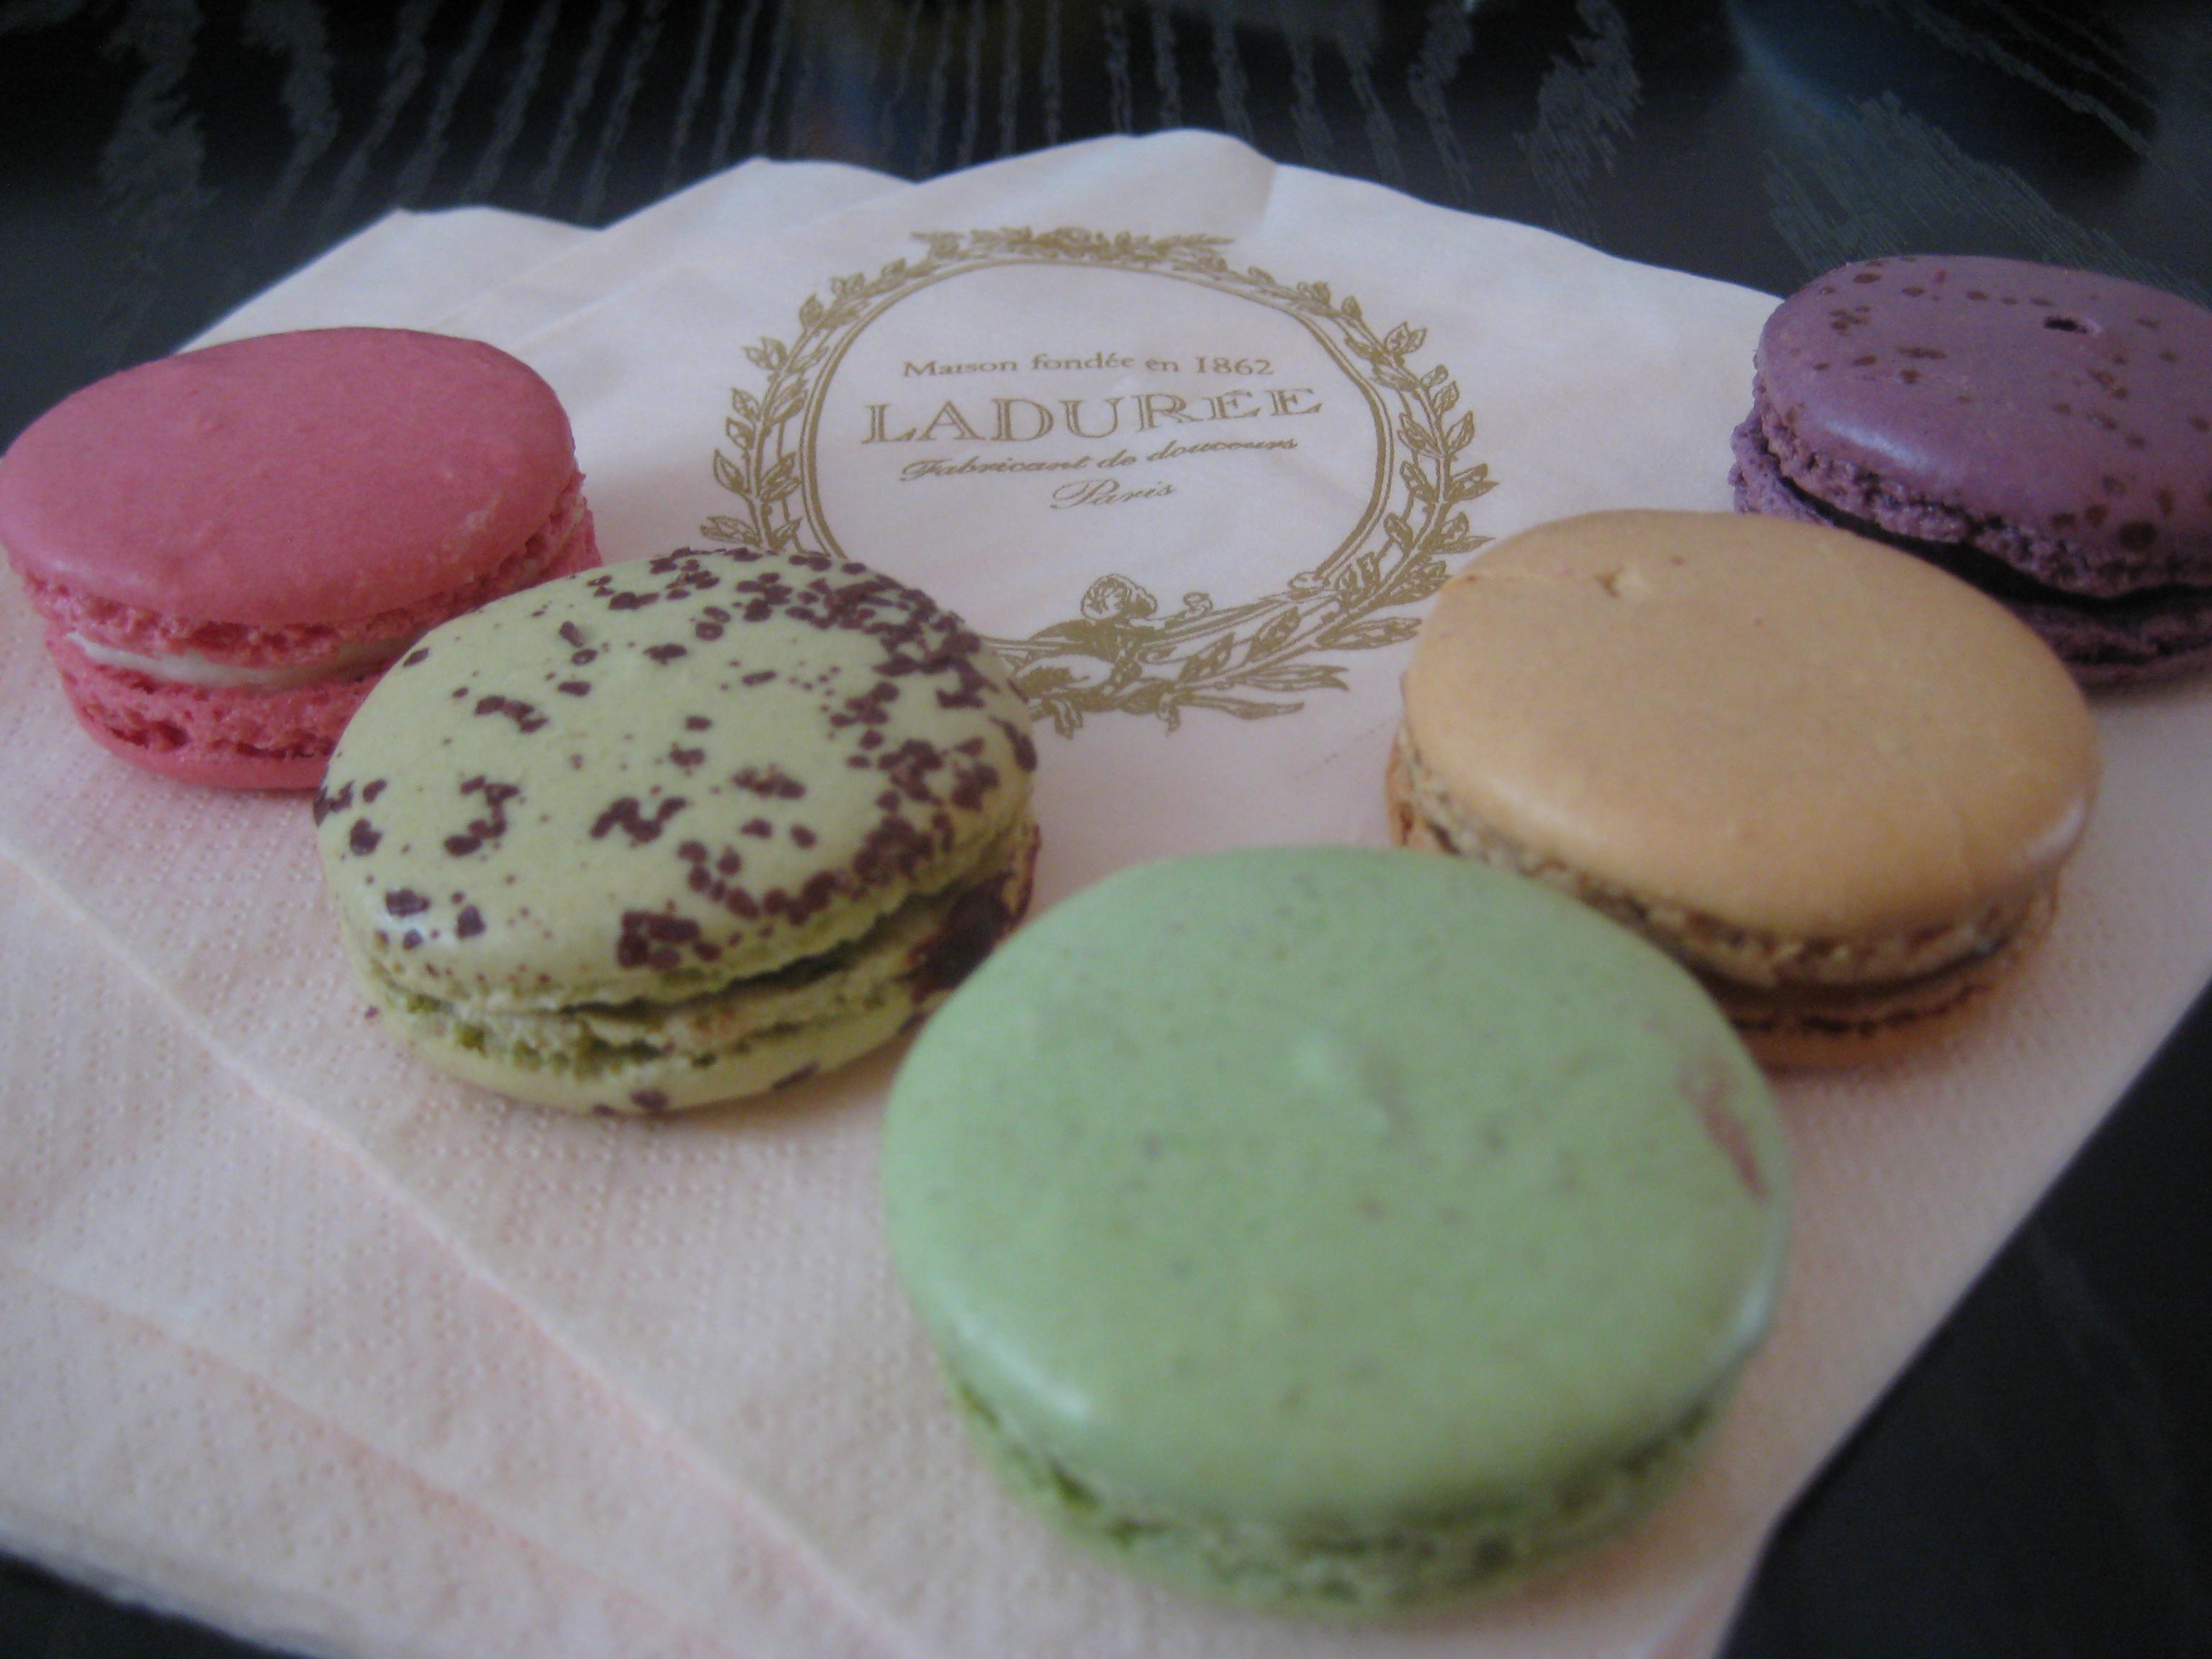 Laduree Macarons, left to right: Rose, Chocolate Mint, Pistachio ...